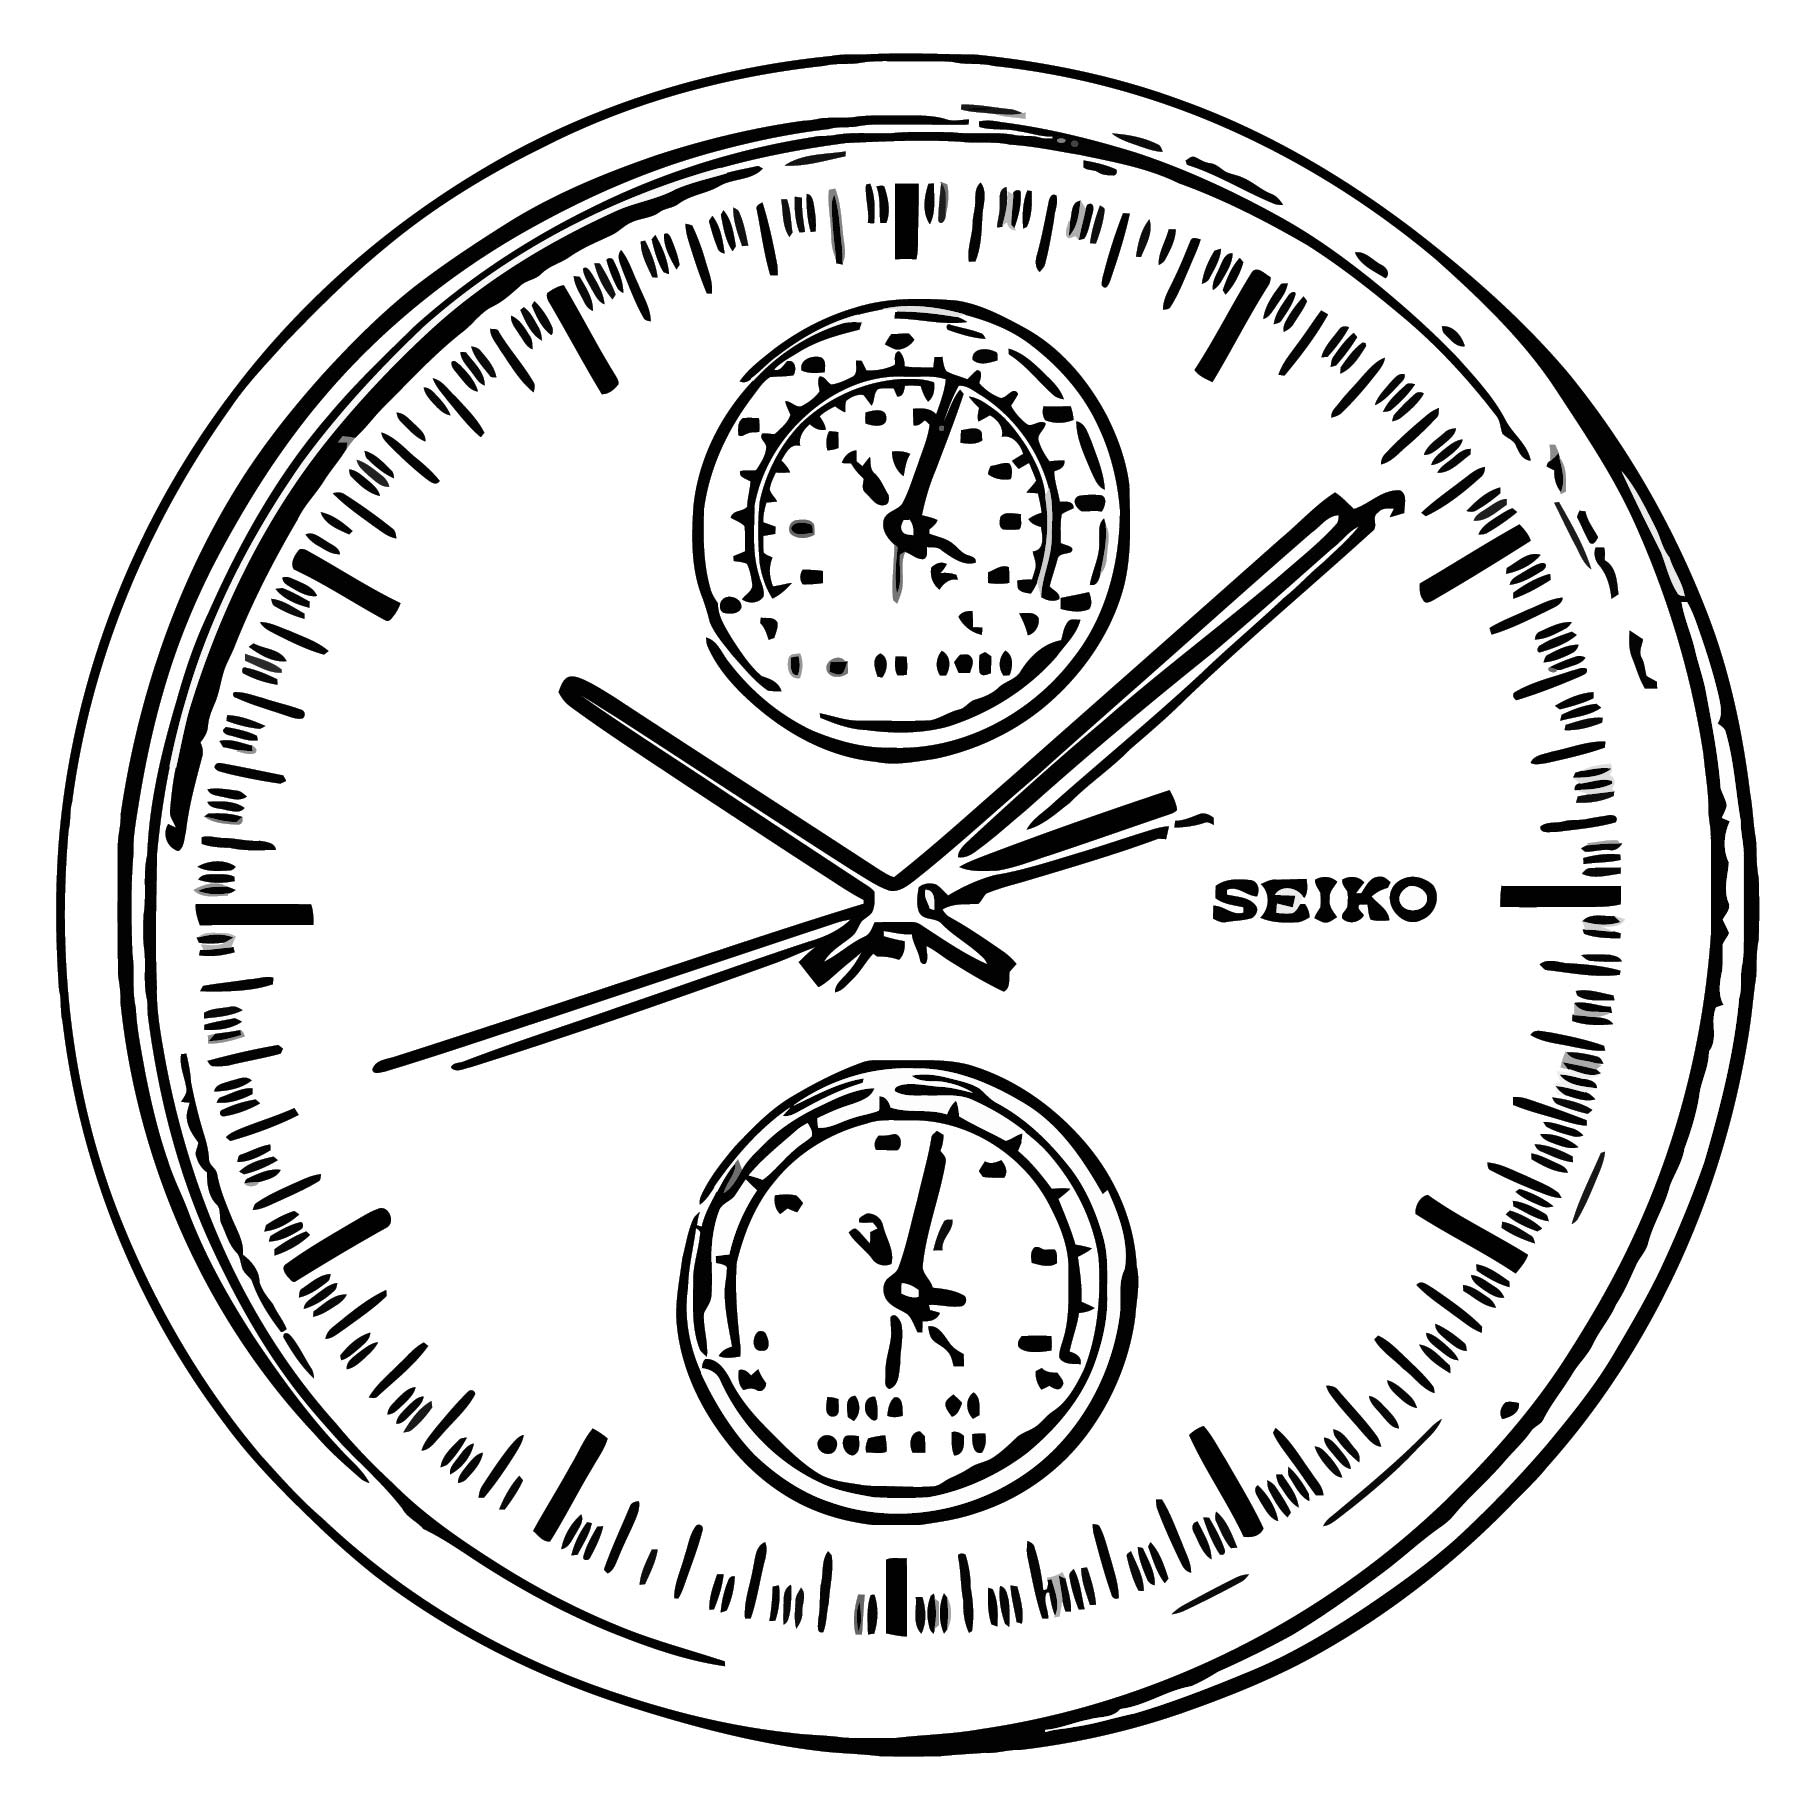 Seikoclo Free Printable Ck Cartoonized Free Printable Coloring Page